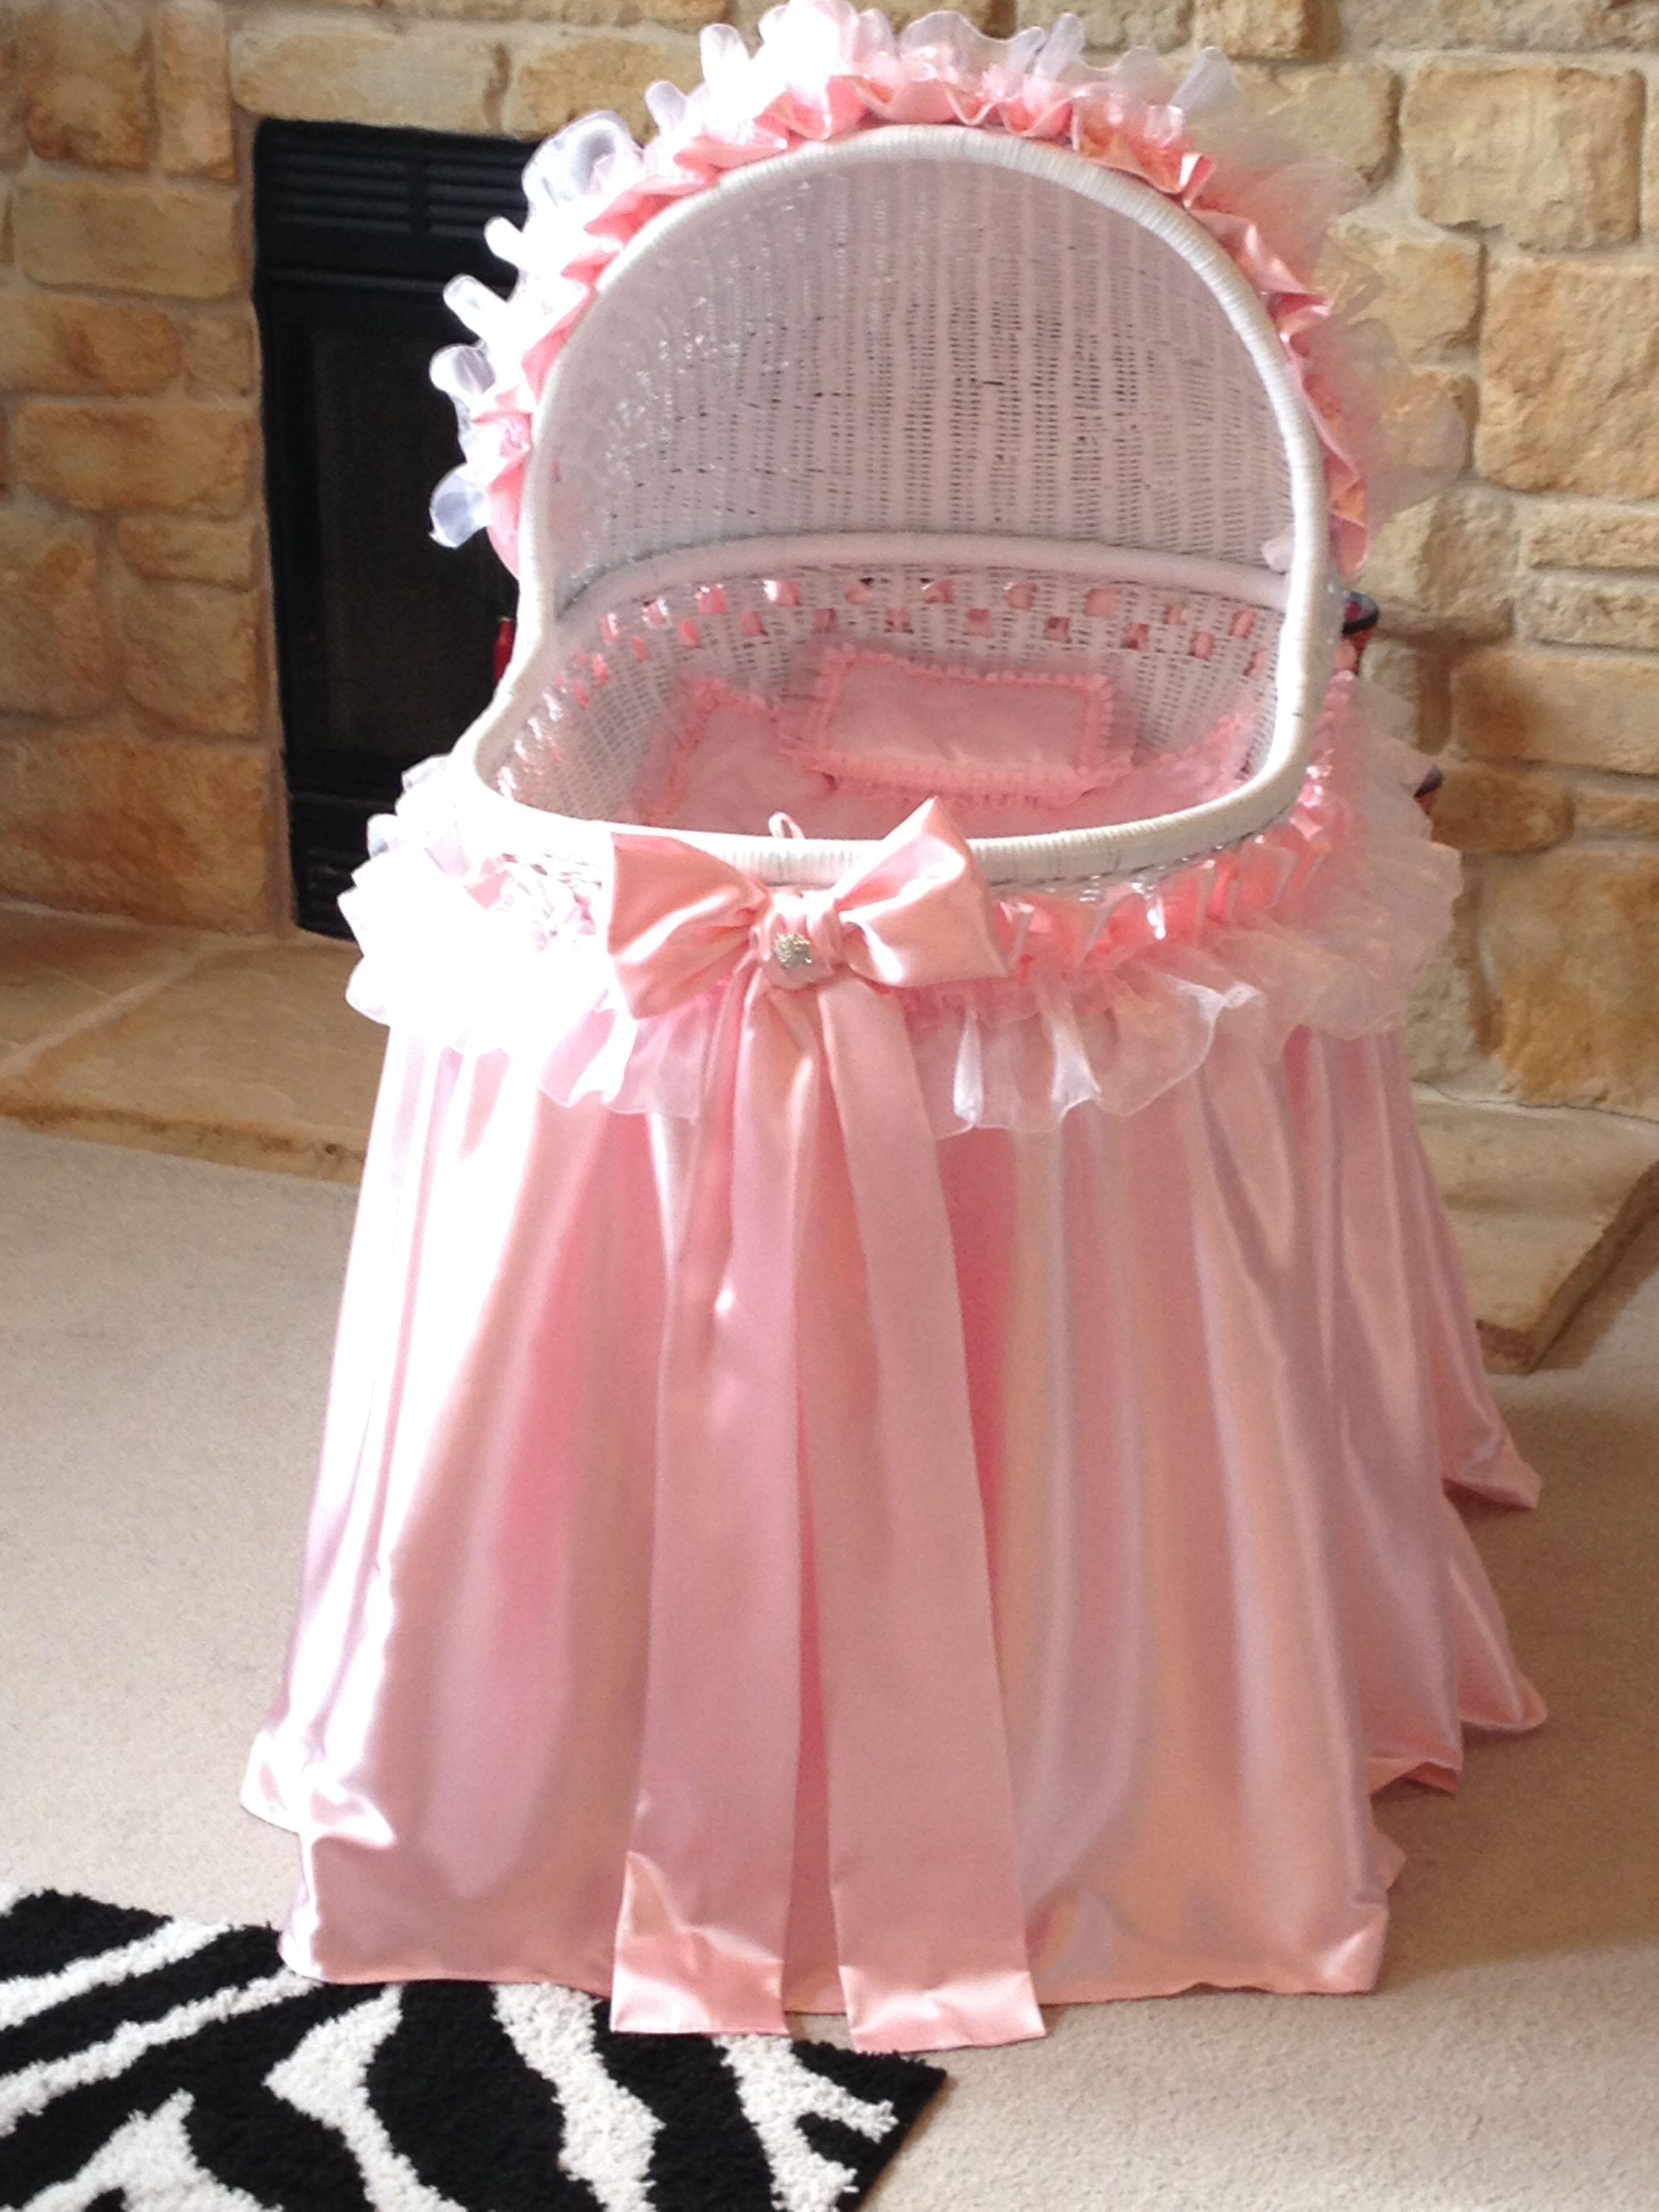 girly pink bassinet baby bassinets pinterest girly babies